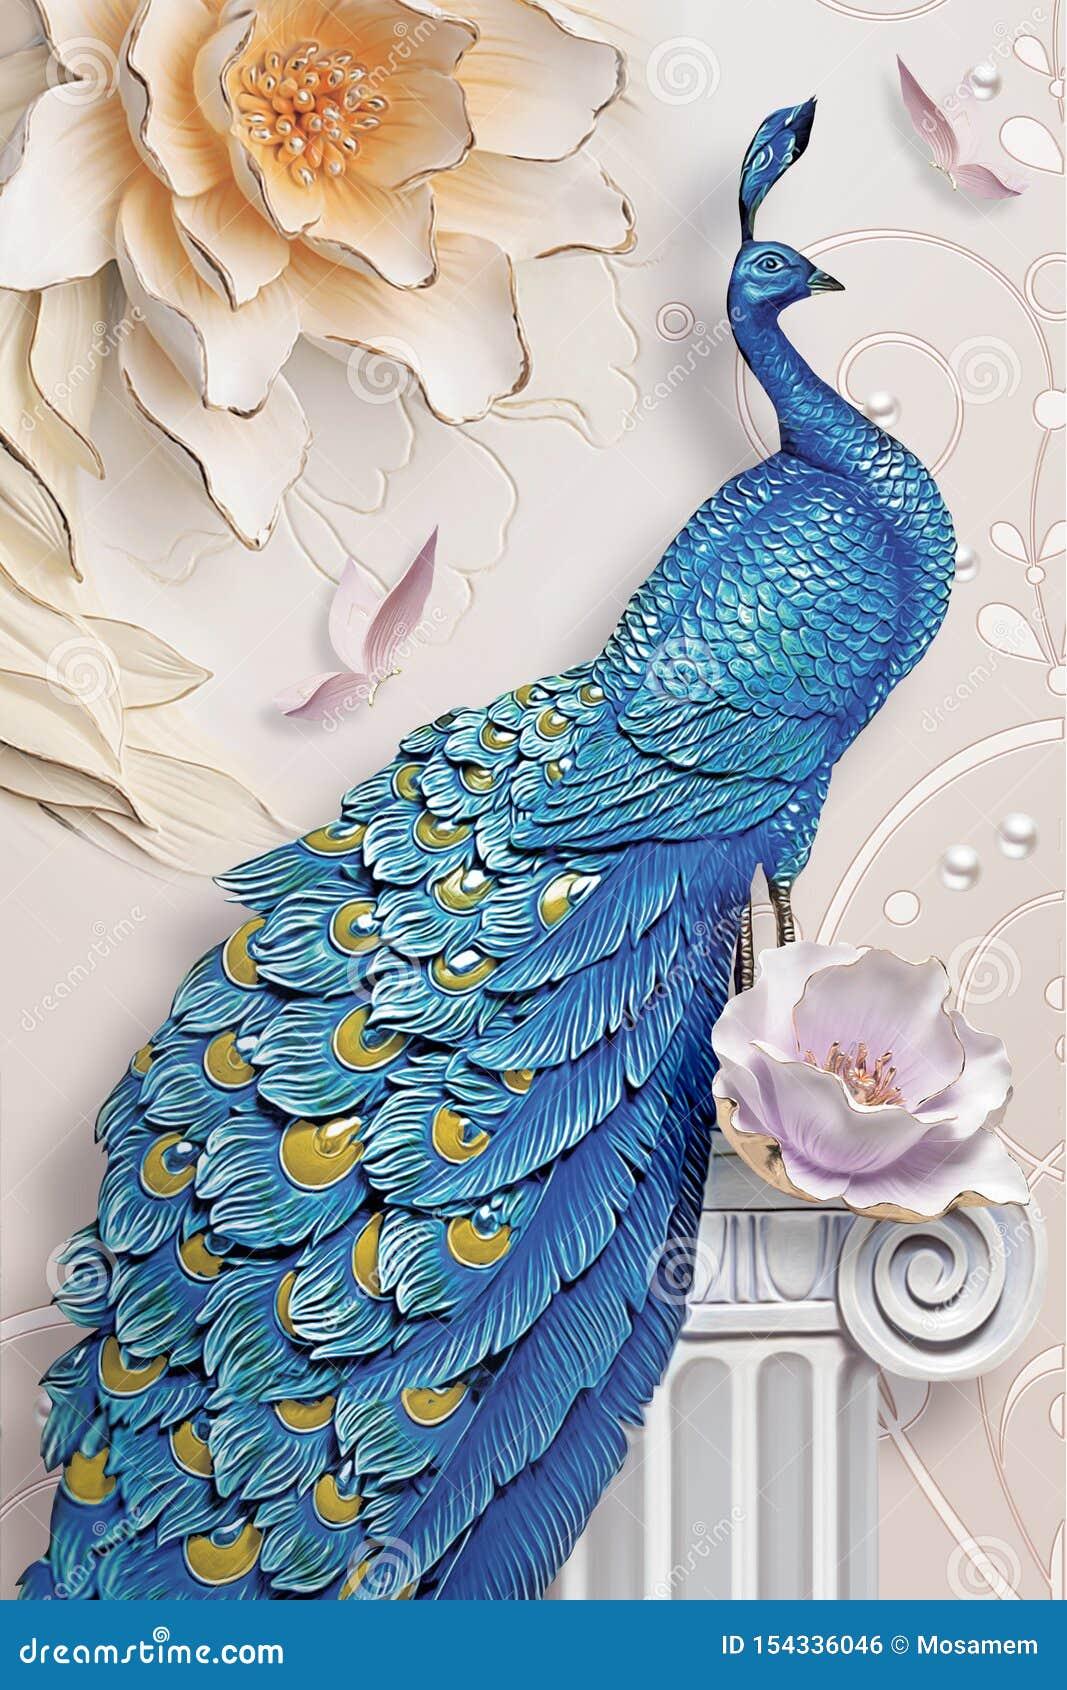 d mural background blue peacock branch wallpaper flowers flowersn 154336046